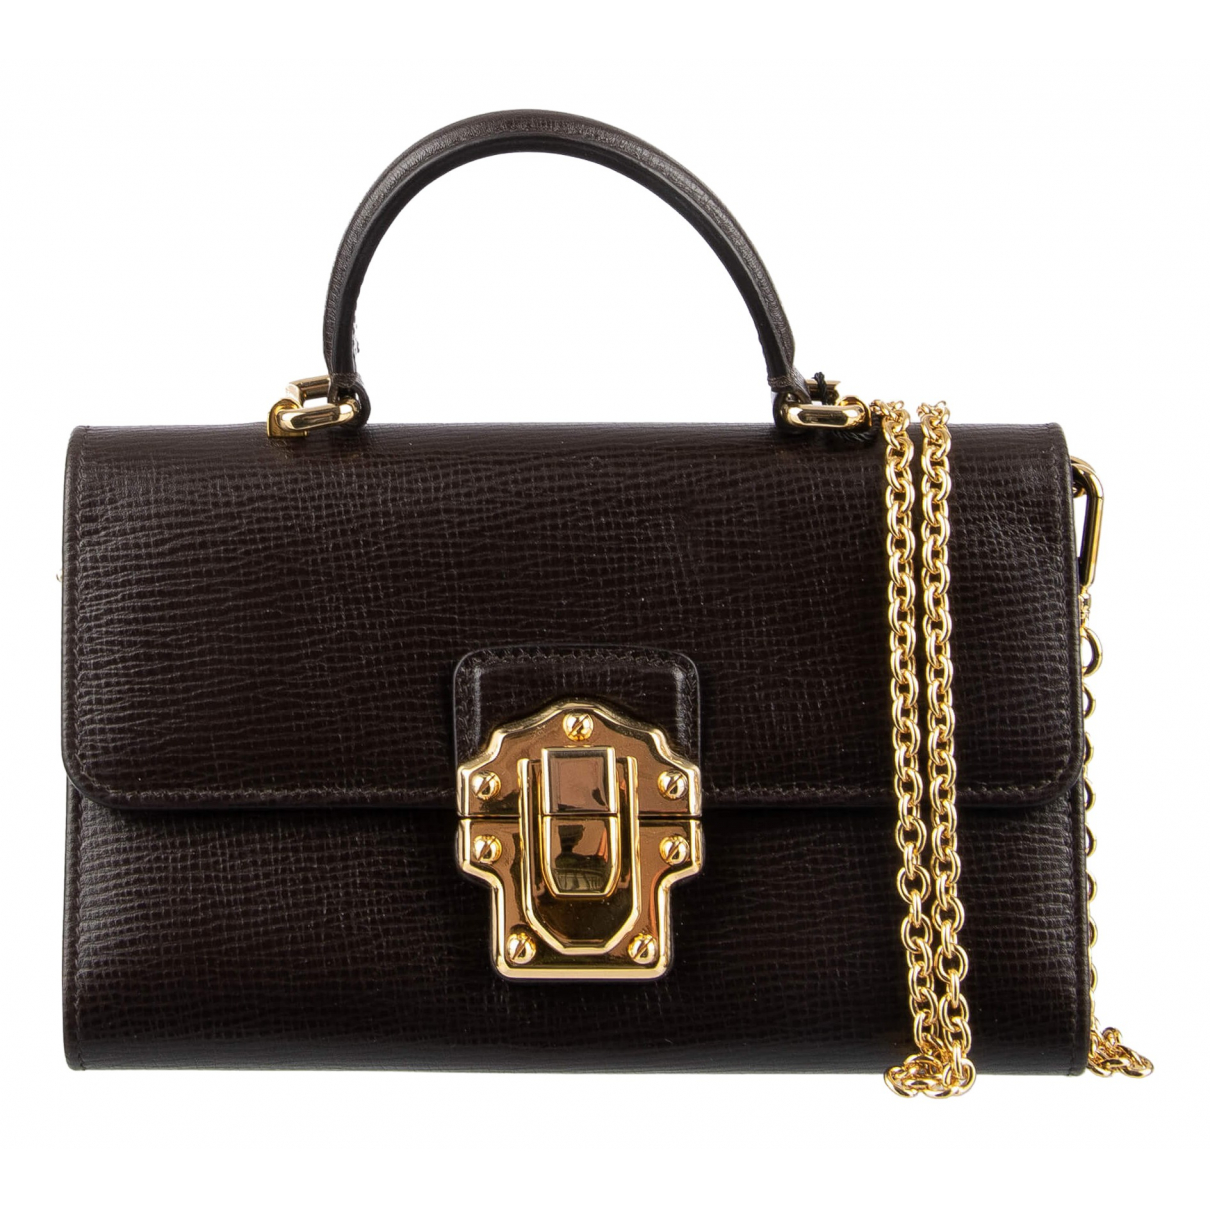 Dolce & Gabbana Lucia Brown Leather handbag for Women \N